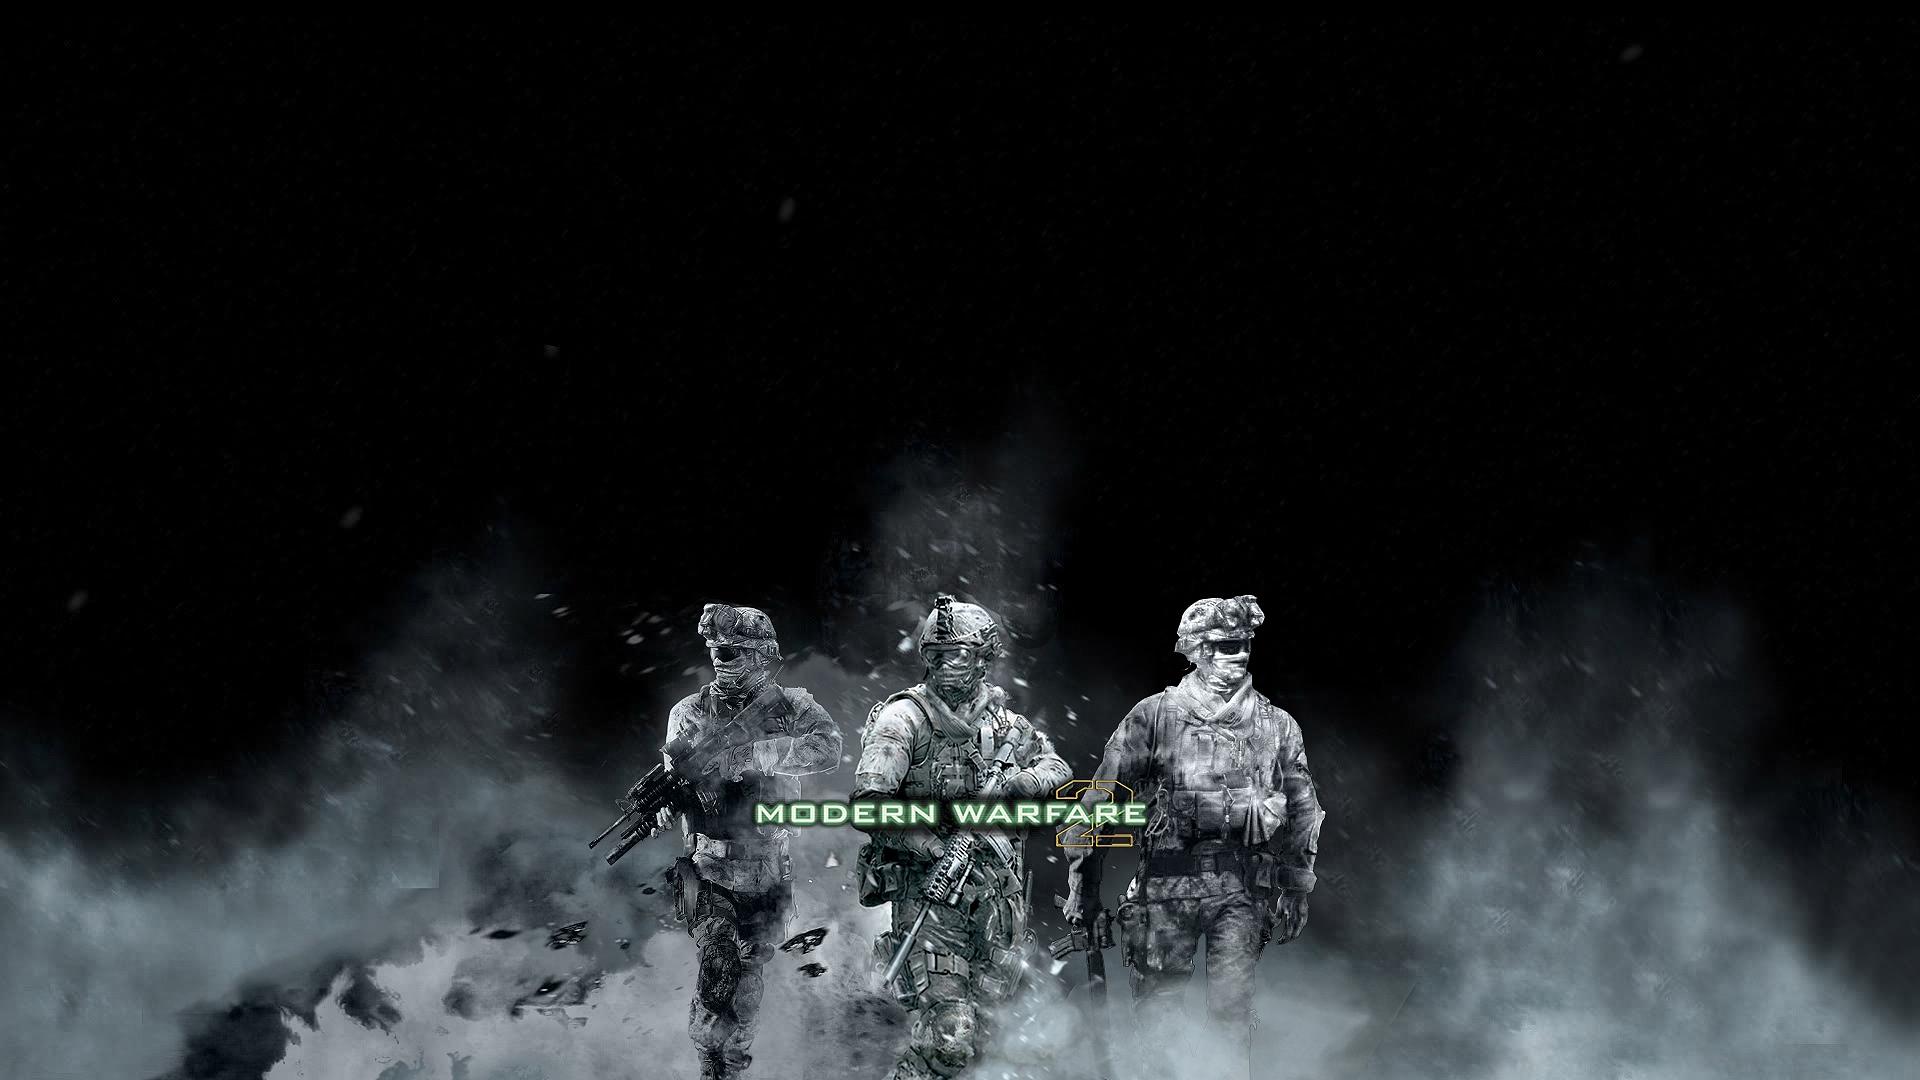 Download Wallpaper 1920x1080 Call Of Duty Modern Warfare 2